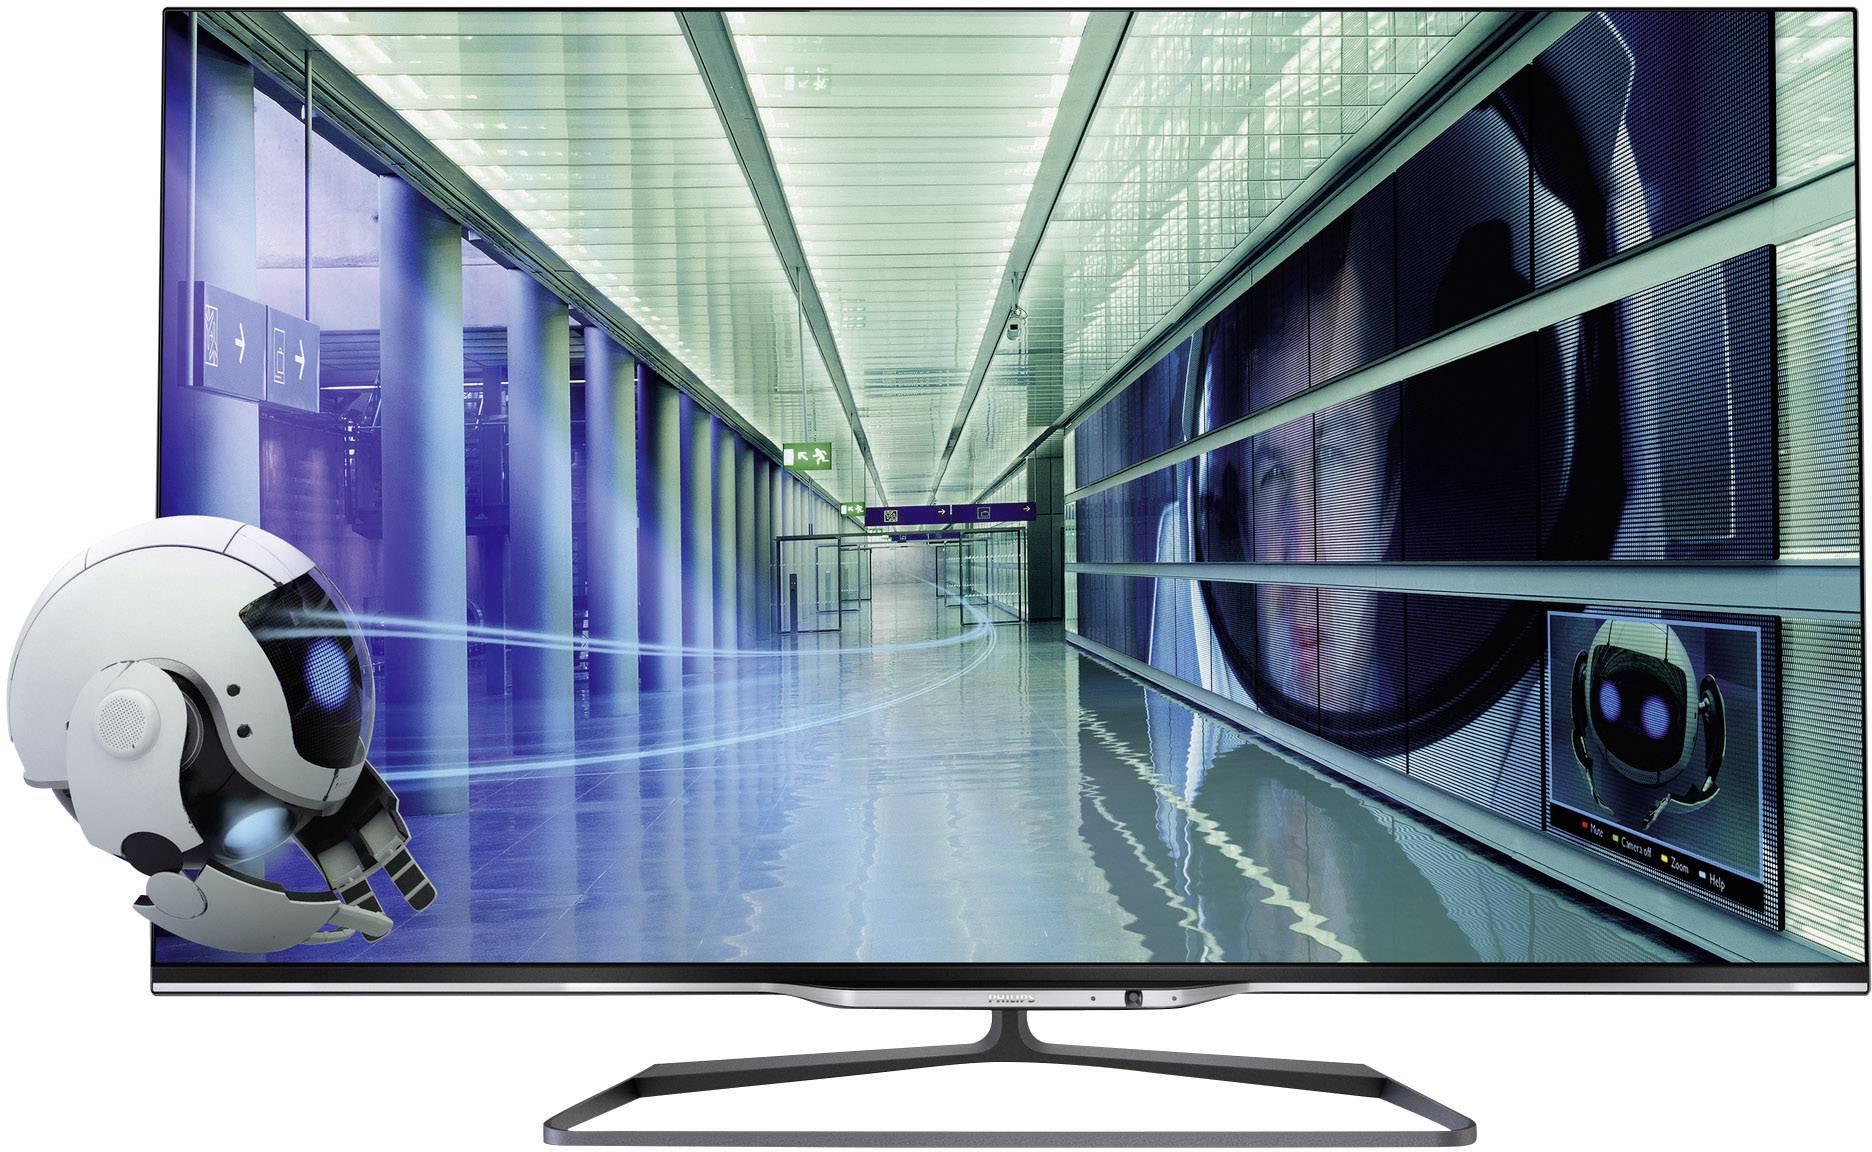 philips pfl7008k 12 led tv 140 cm 55 inch dvb t dvb c dvb s full hd 3d smart tv wi fi pvr ready ci skype blac